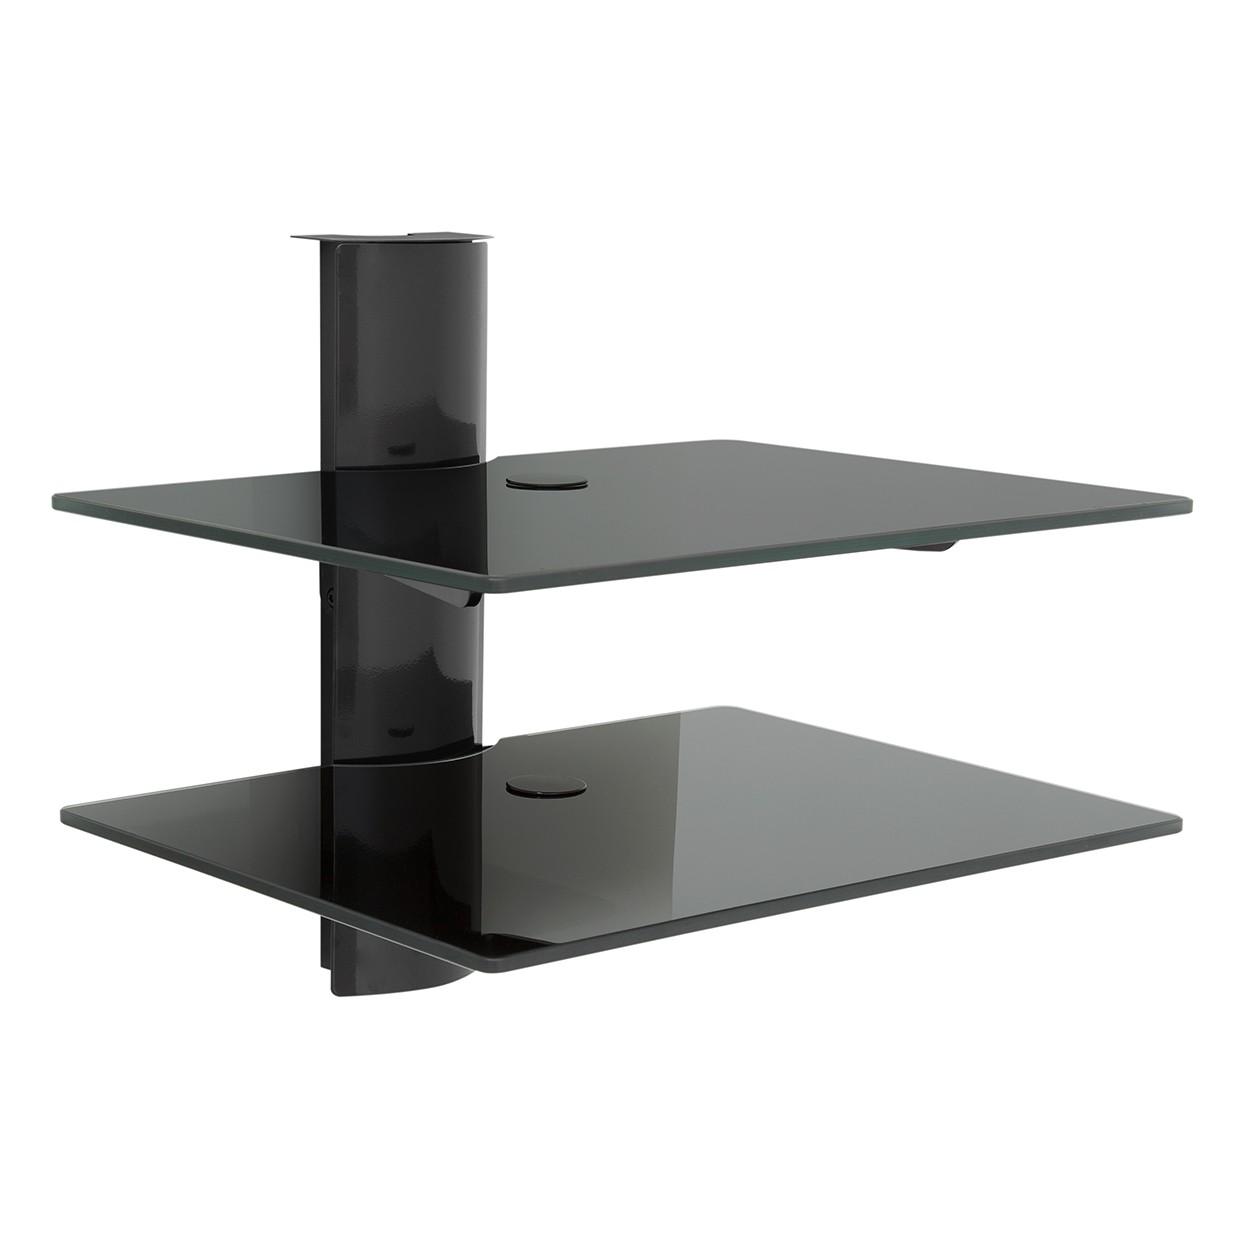 RACK SIMPLY 45/2 C BLACK GLASS BLACK